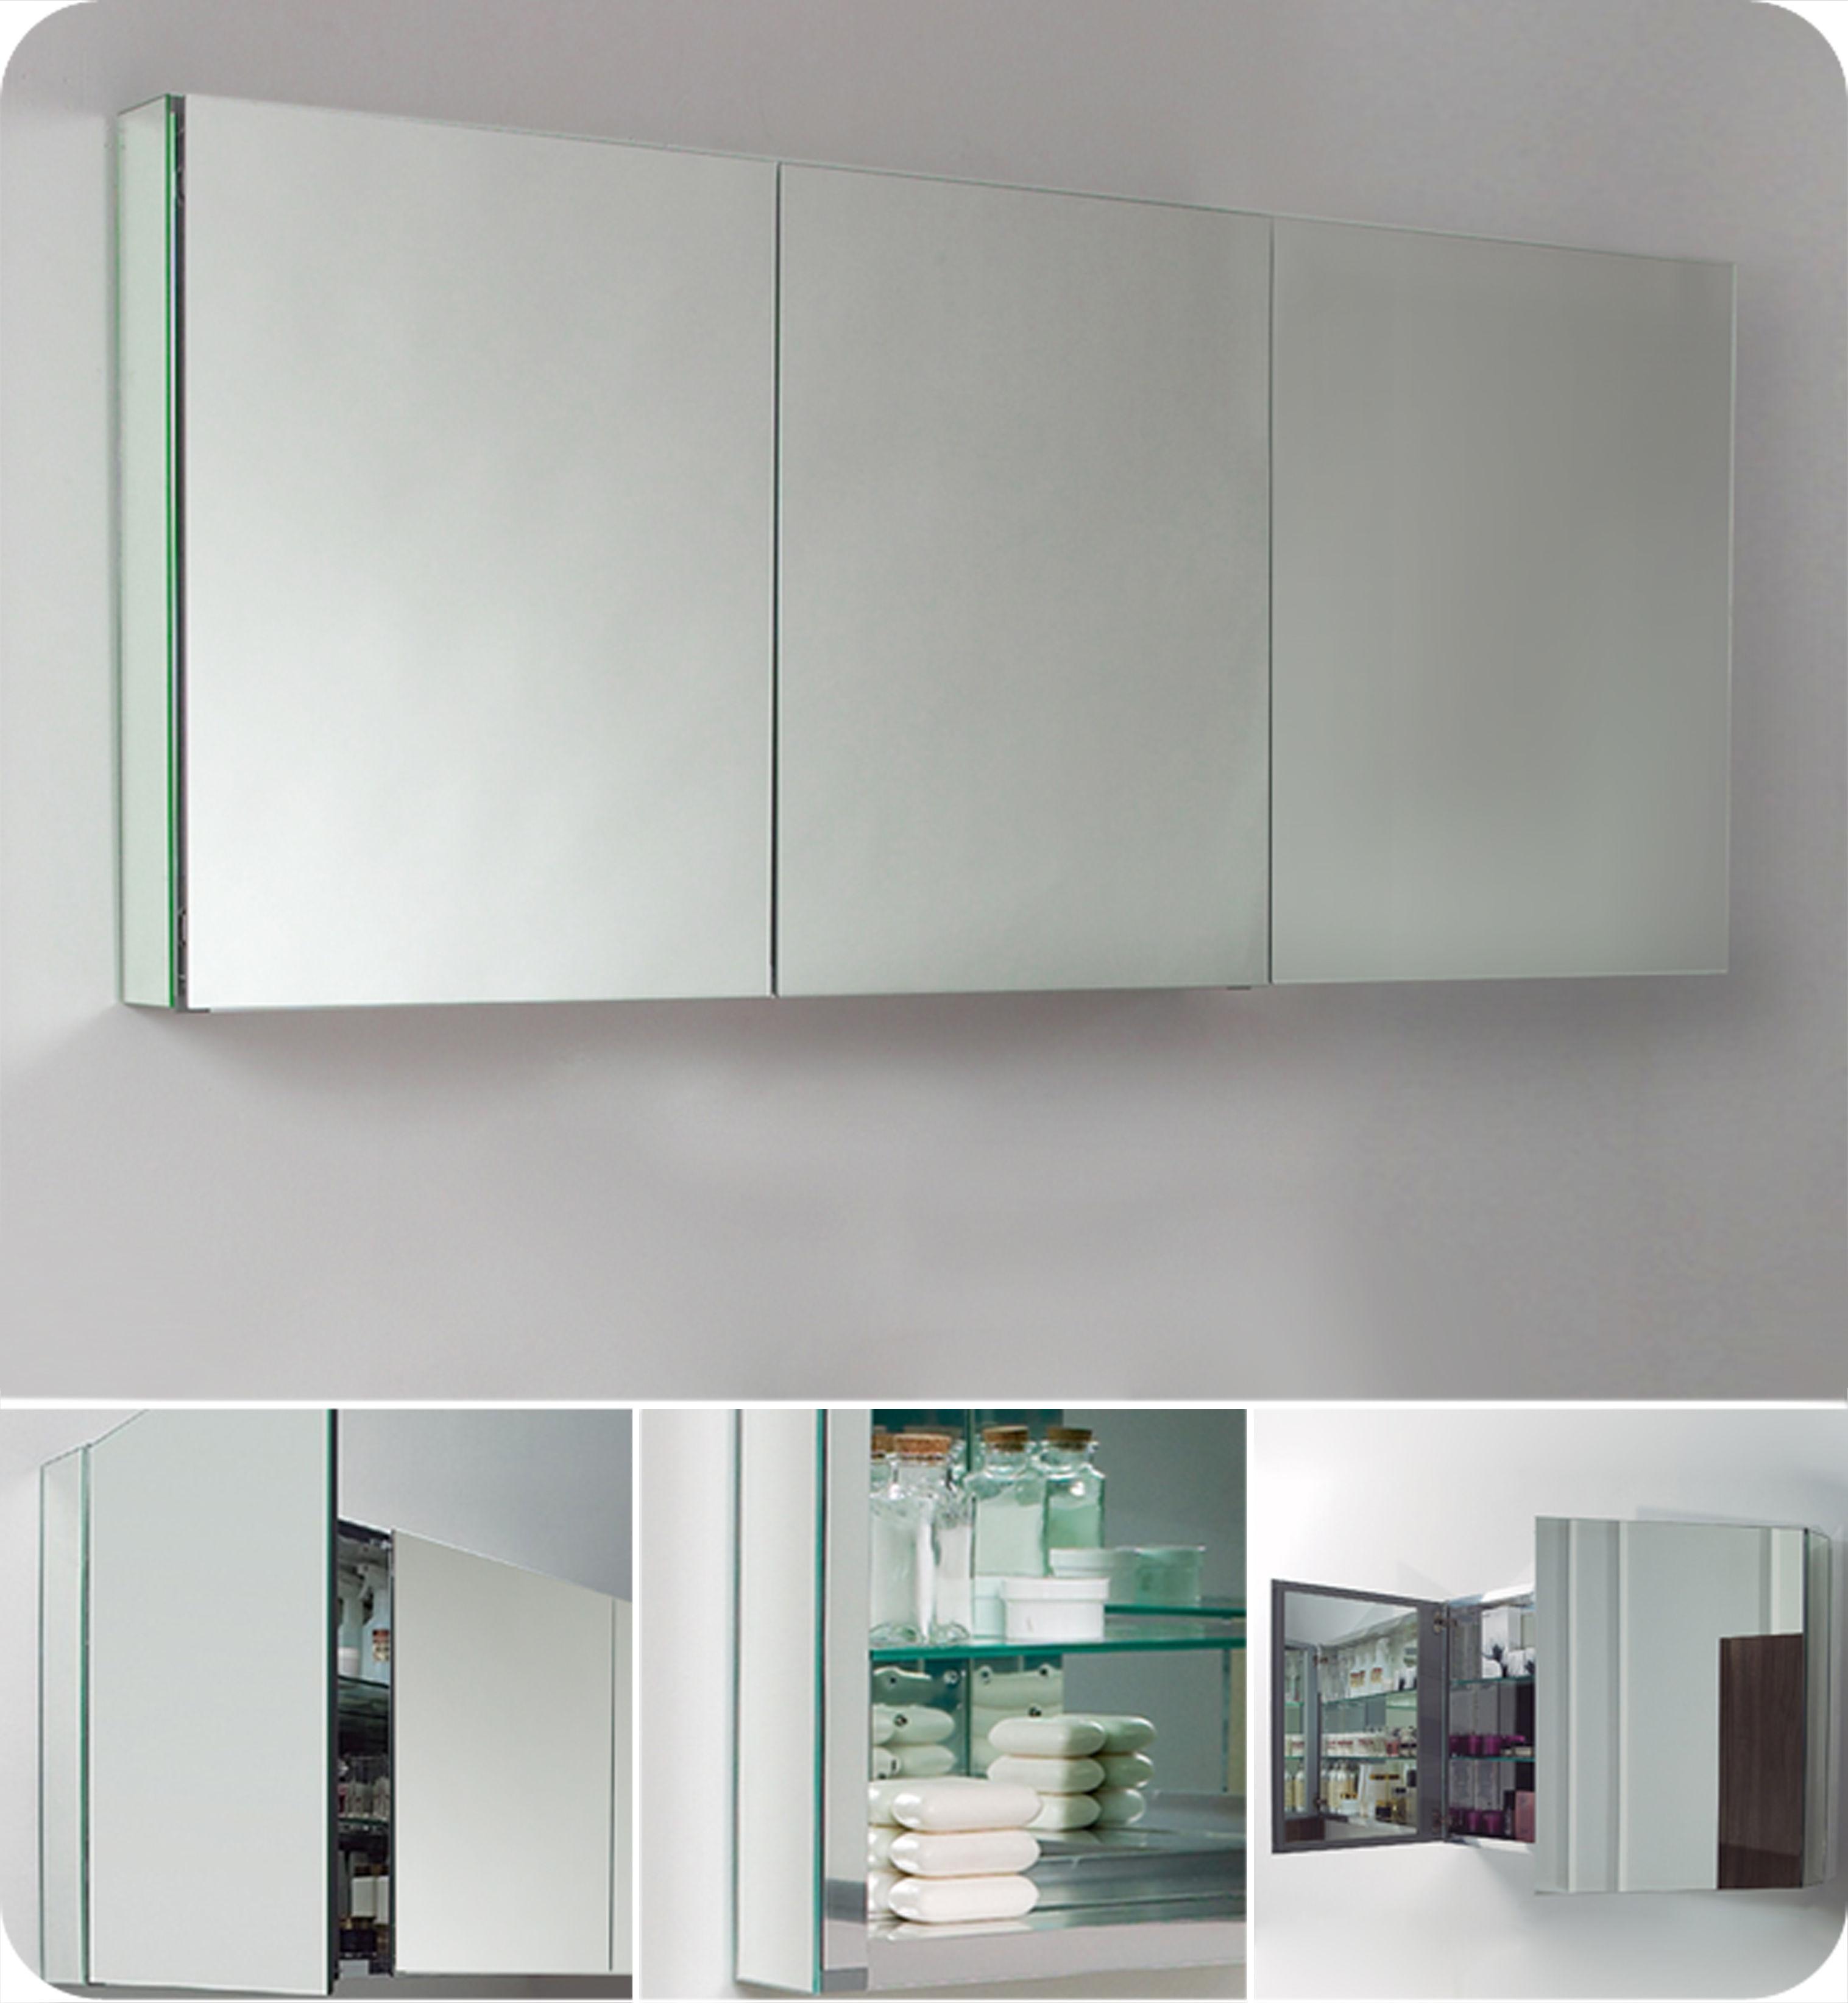 18 X 24 Medicine Cabinet Medicine Cabinets At Faucetdirectcom